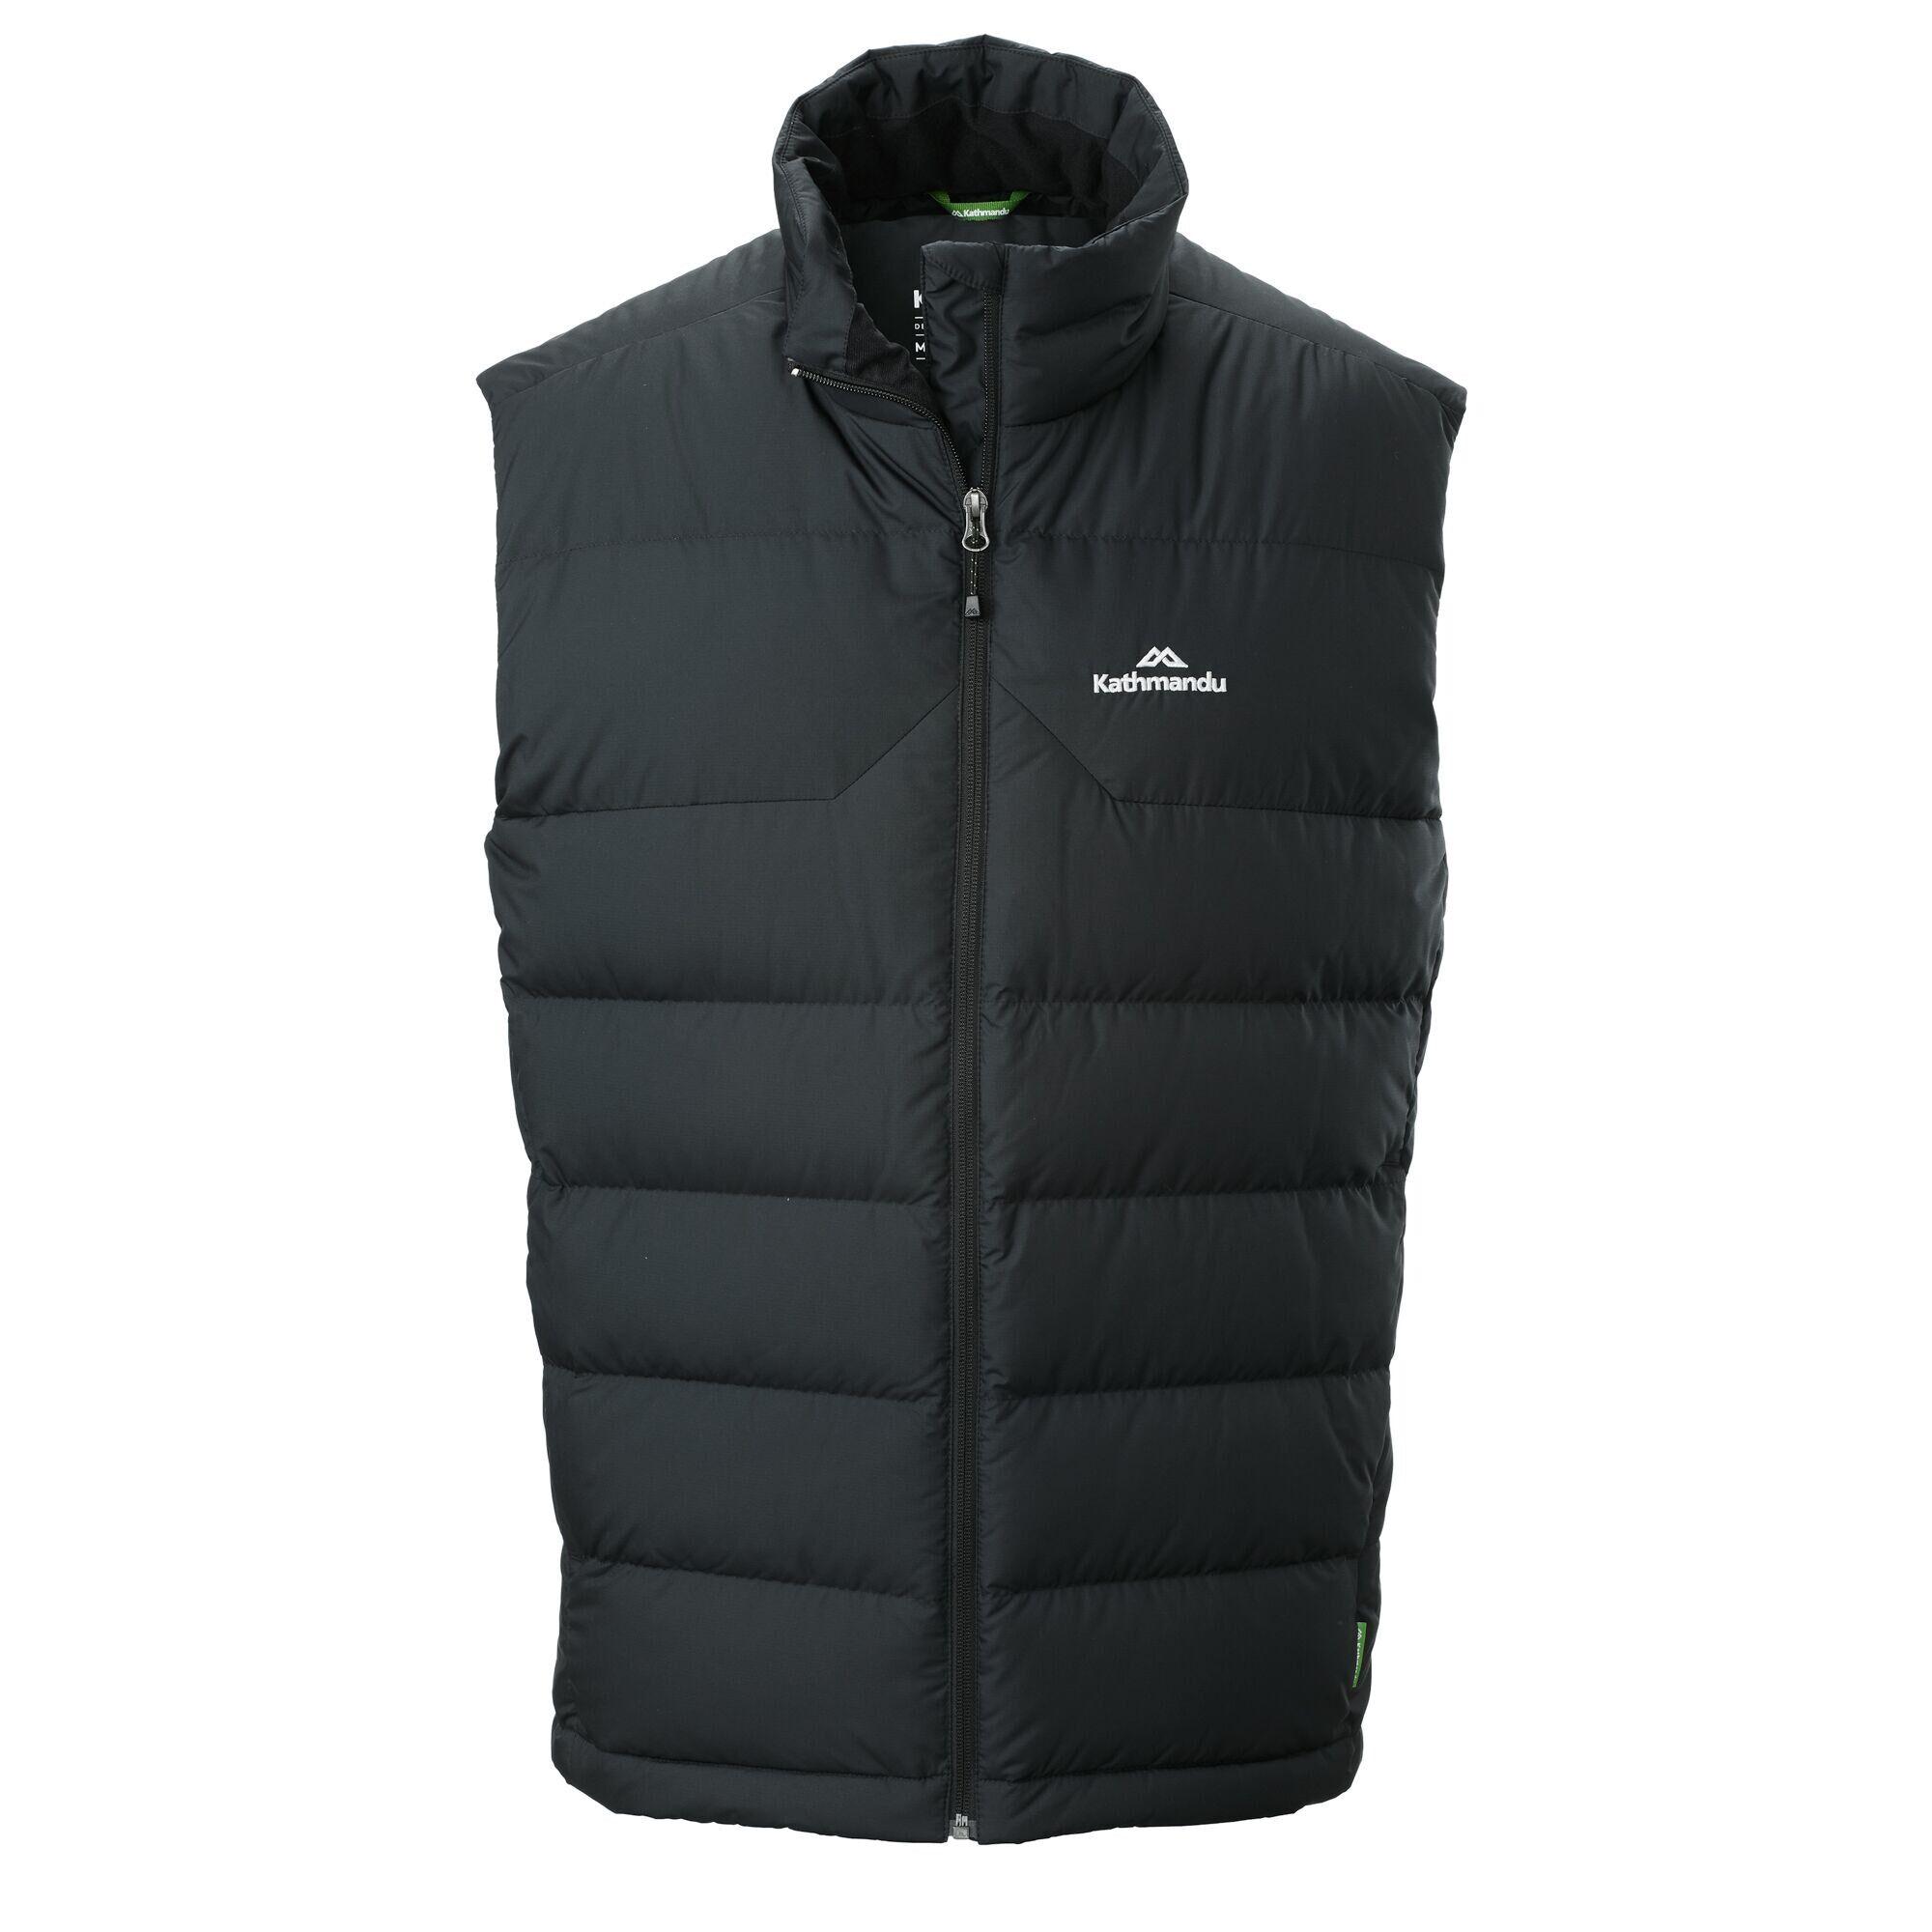 Kathmandu Epiq Men's 600 Fill Down Vest  - Black - Size: Medium